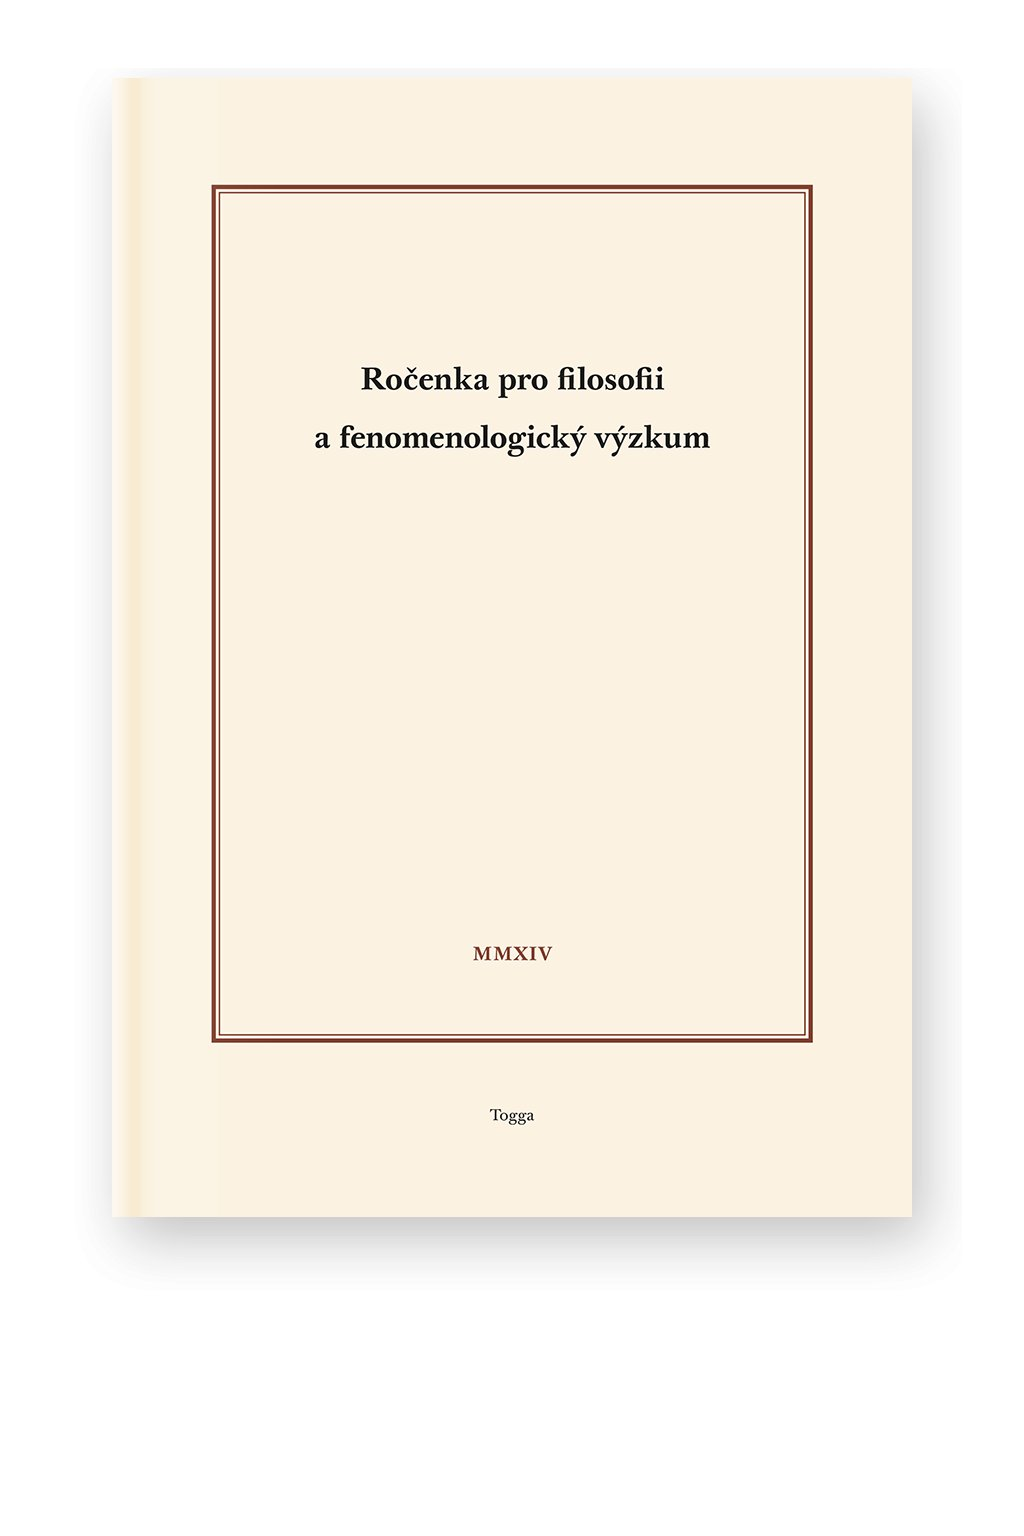 1017 rocenka pro filosofii a fenomenologicky vyzkum 2014